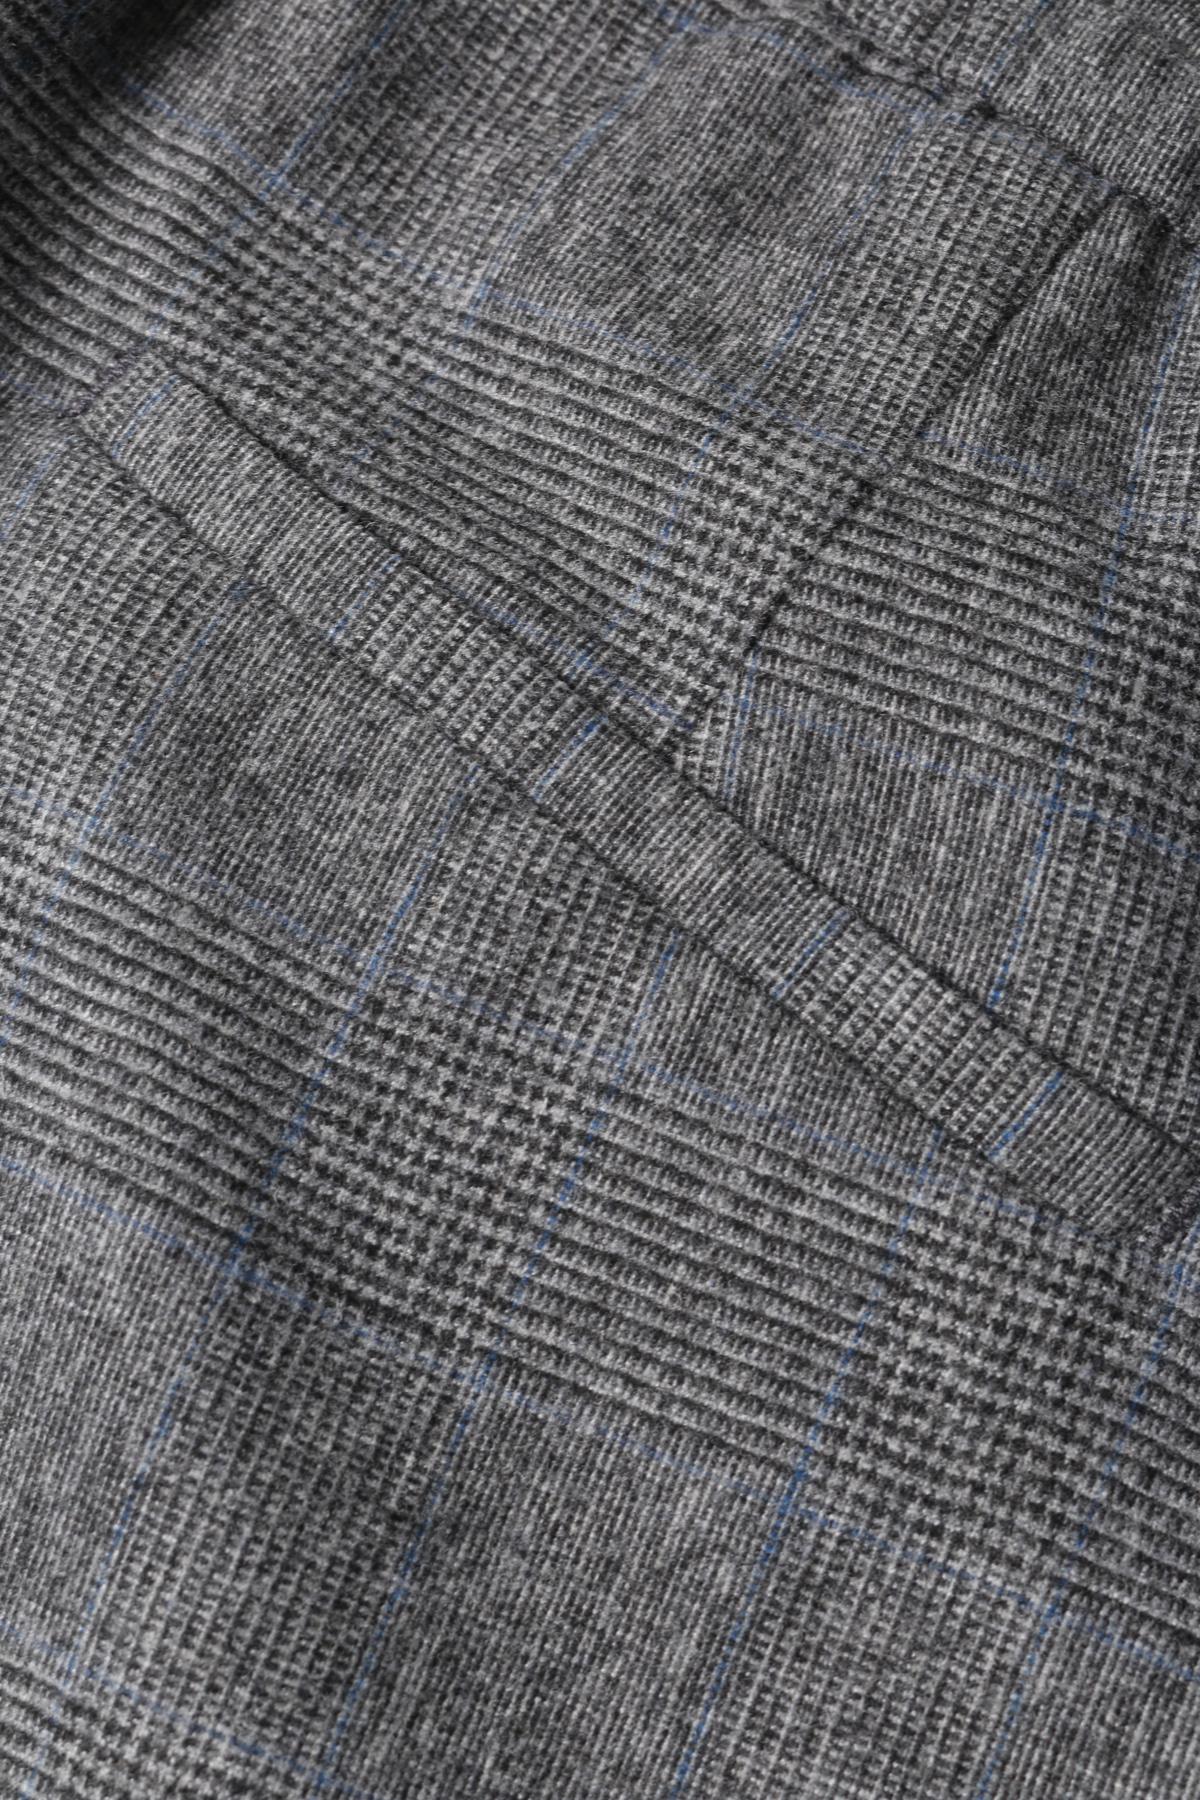 wollhose chasy mit glencheck muster grau - Glencheck Muster